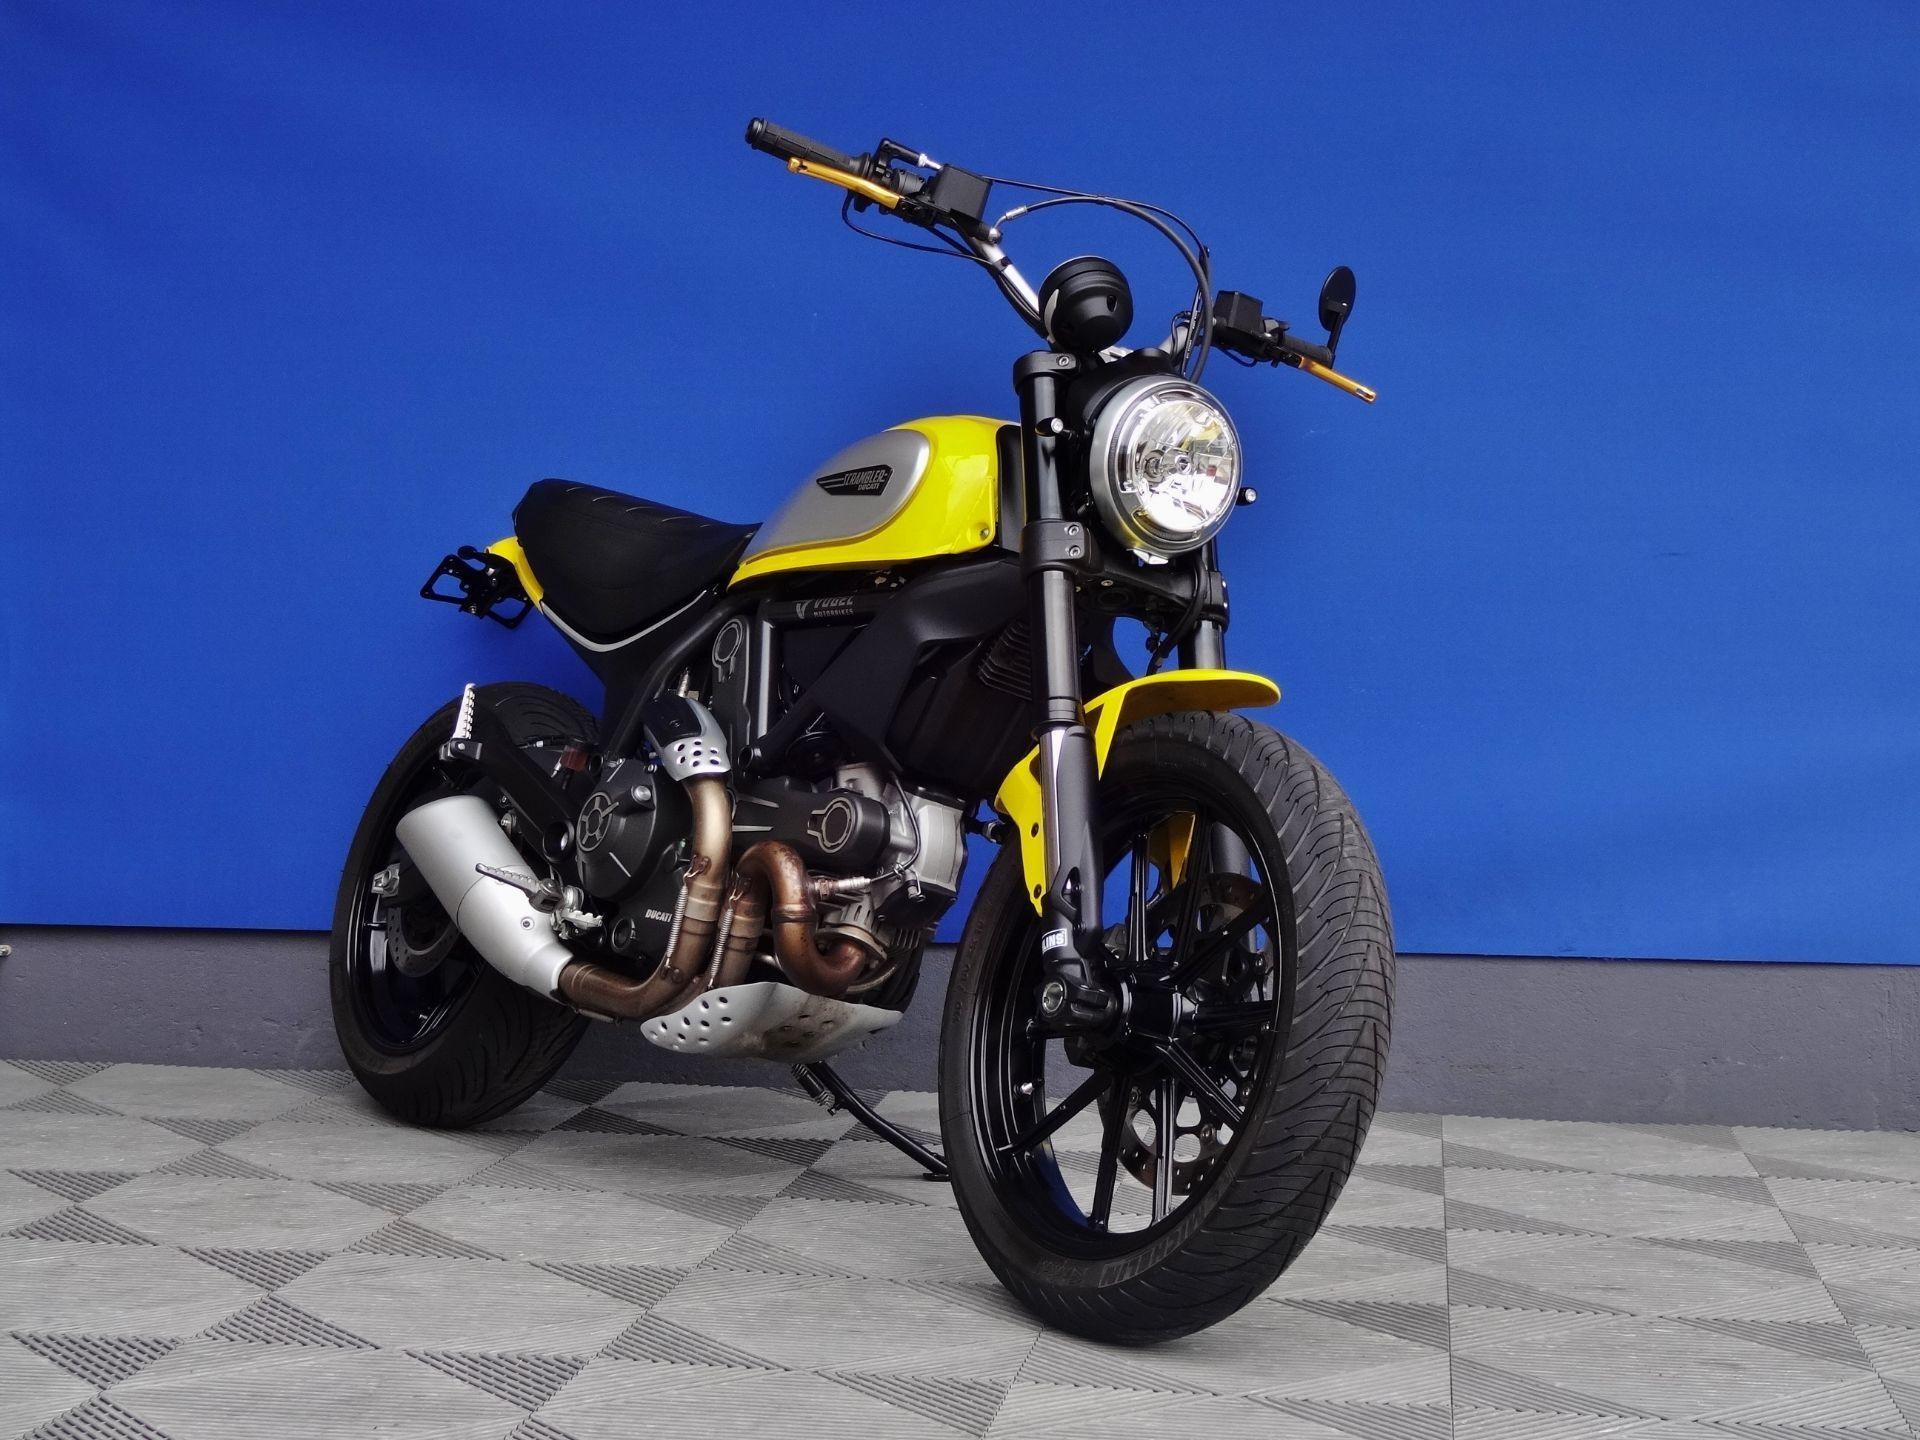 Ducati Scrambler Komfortsitzbank Motorrad Bild Idee